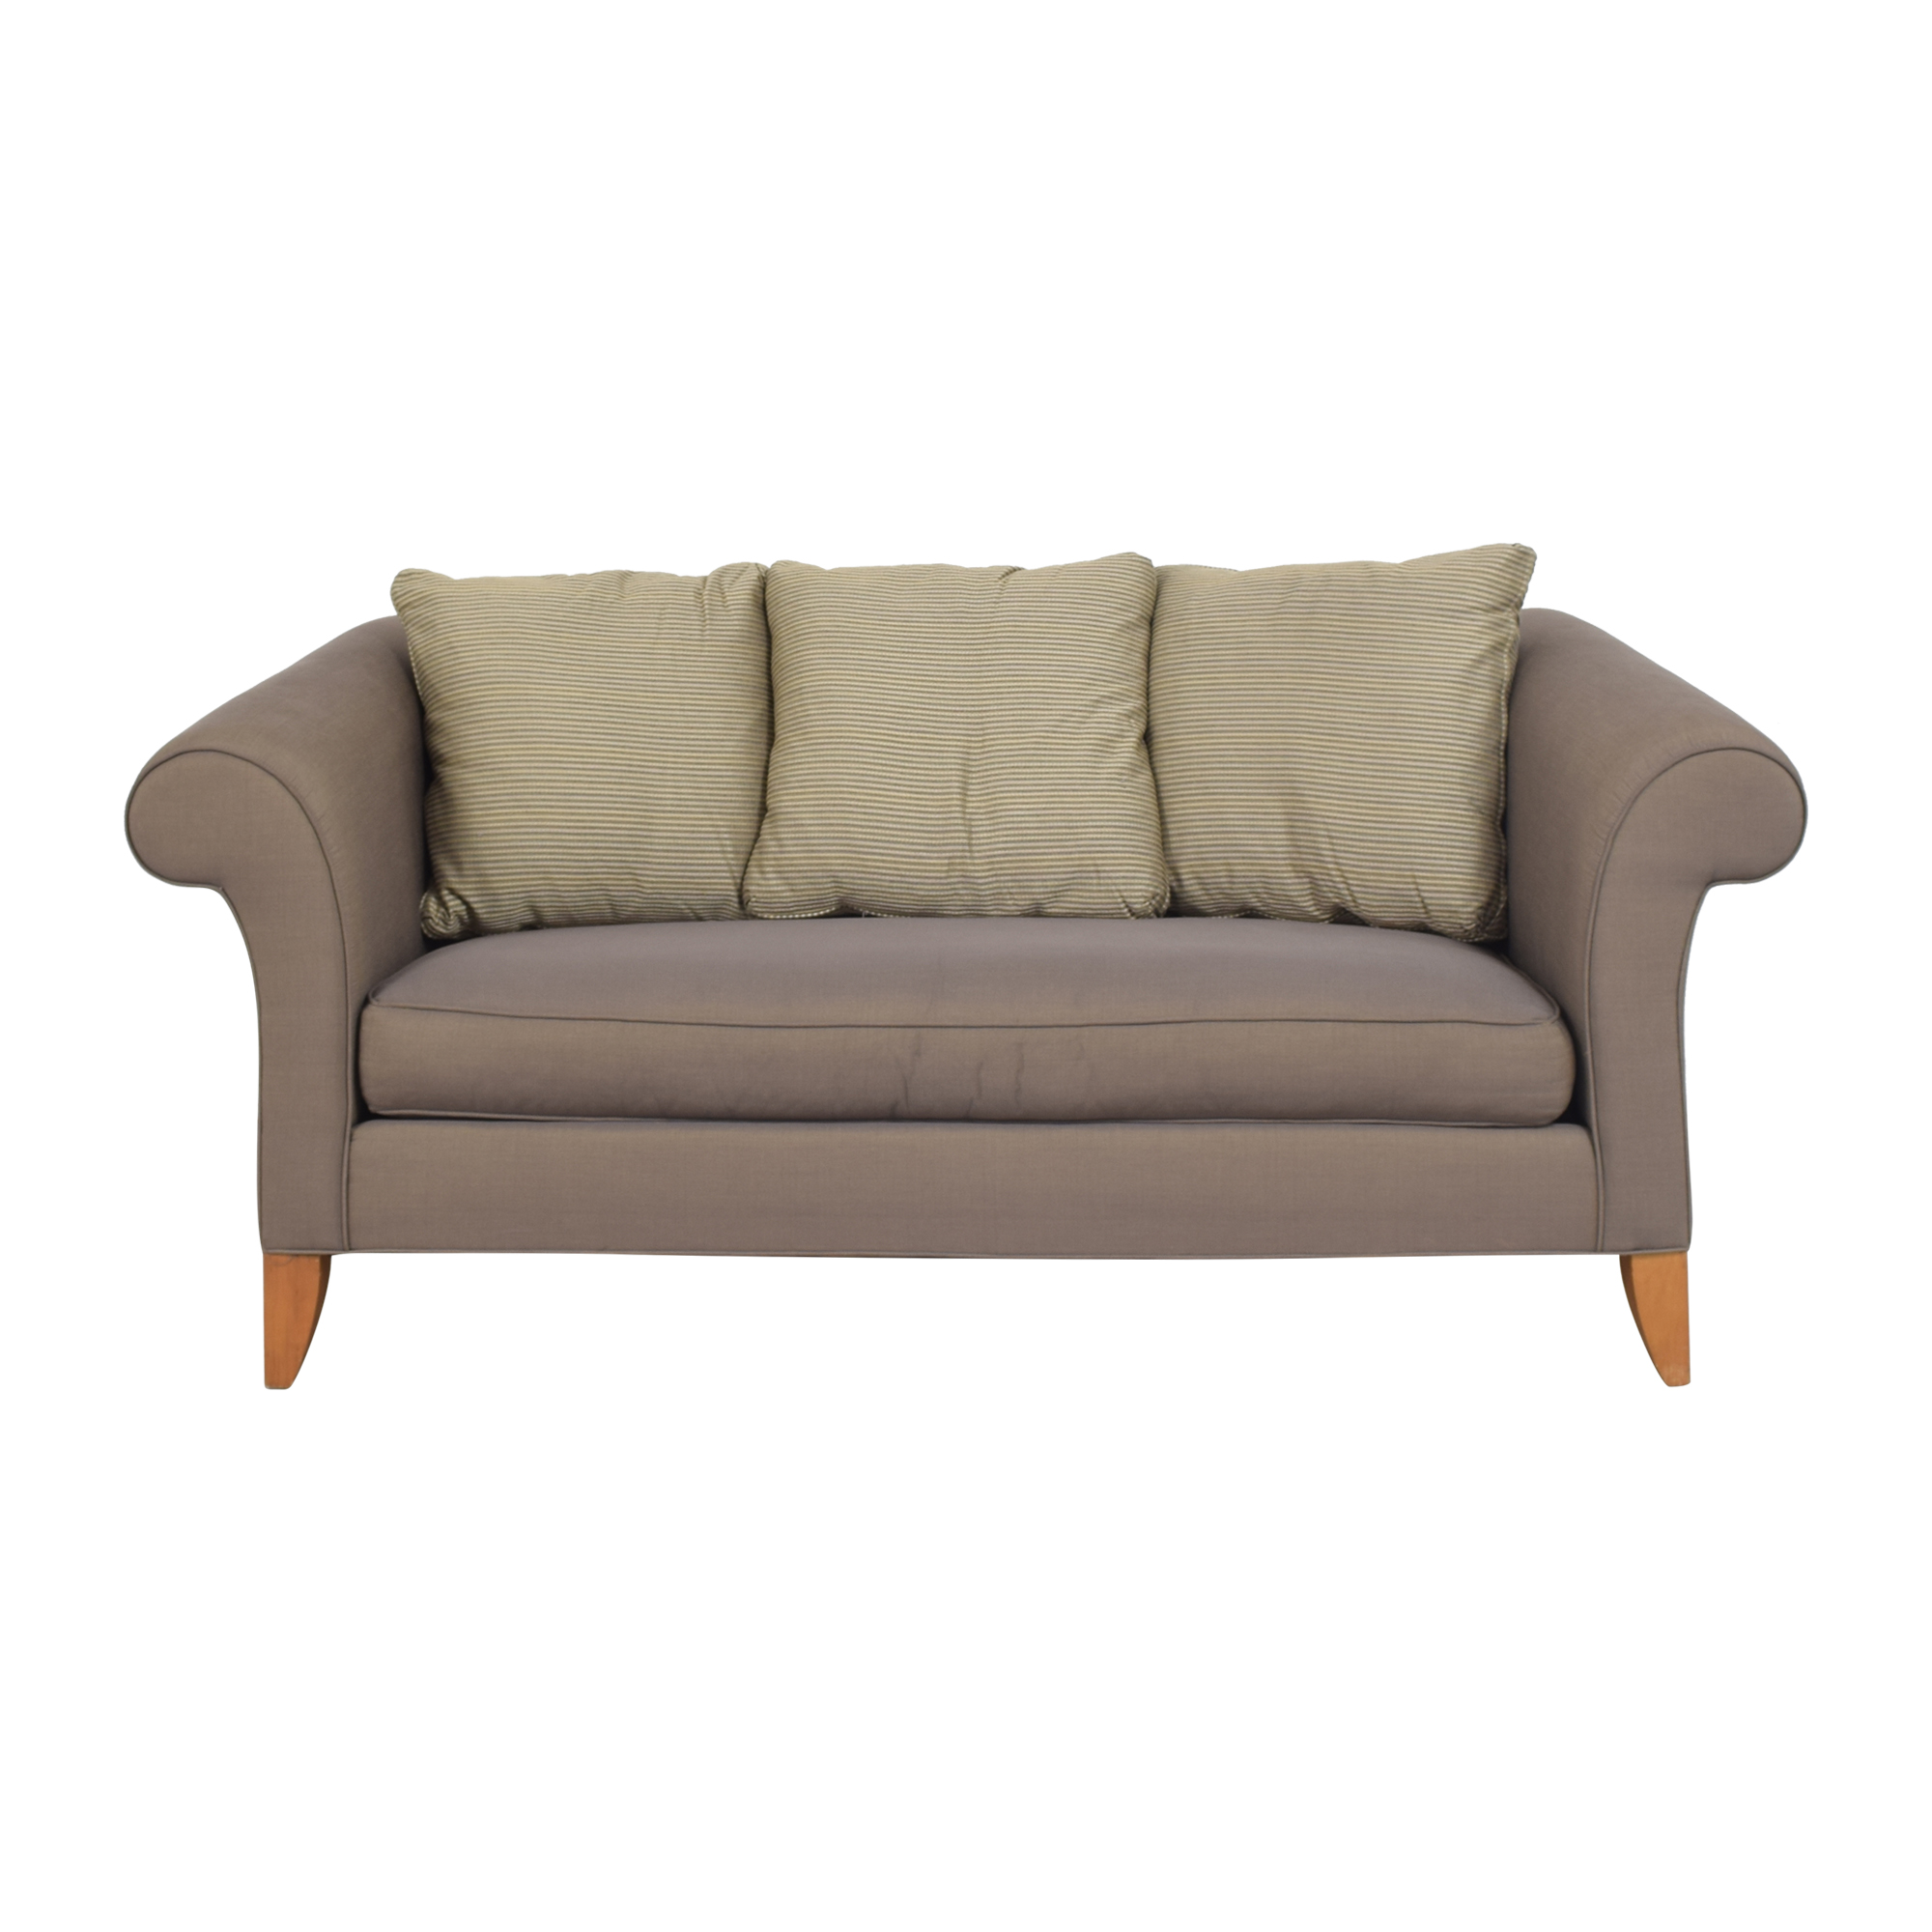 Ethan Allen Ethan Allen Shelter Sofa GRAY